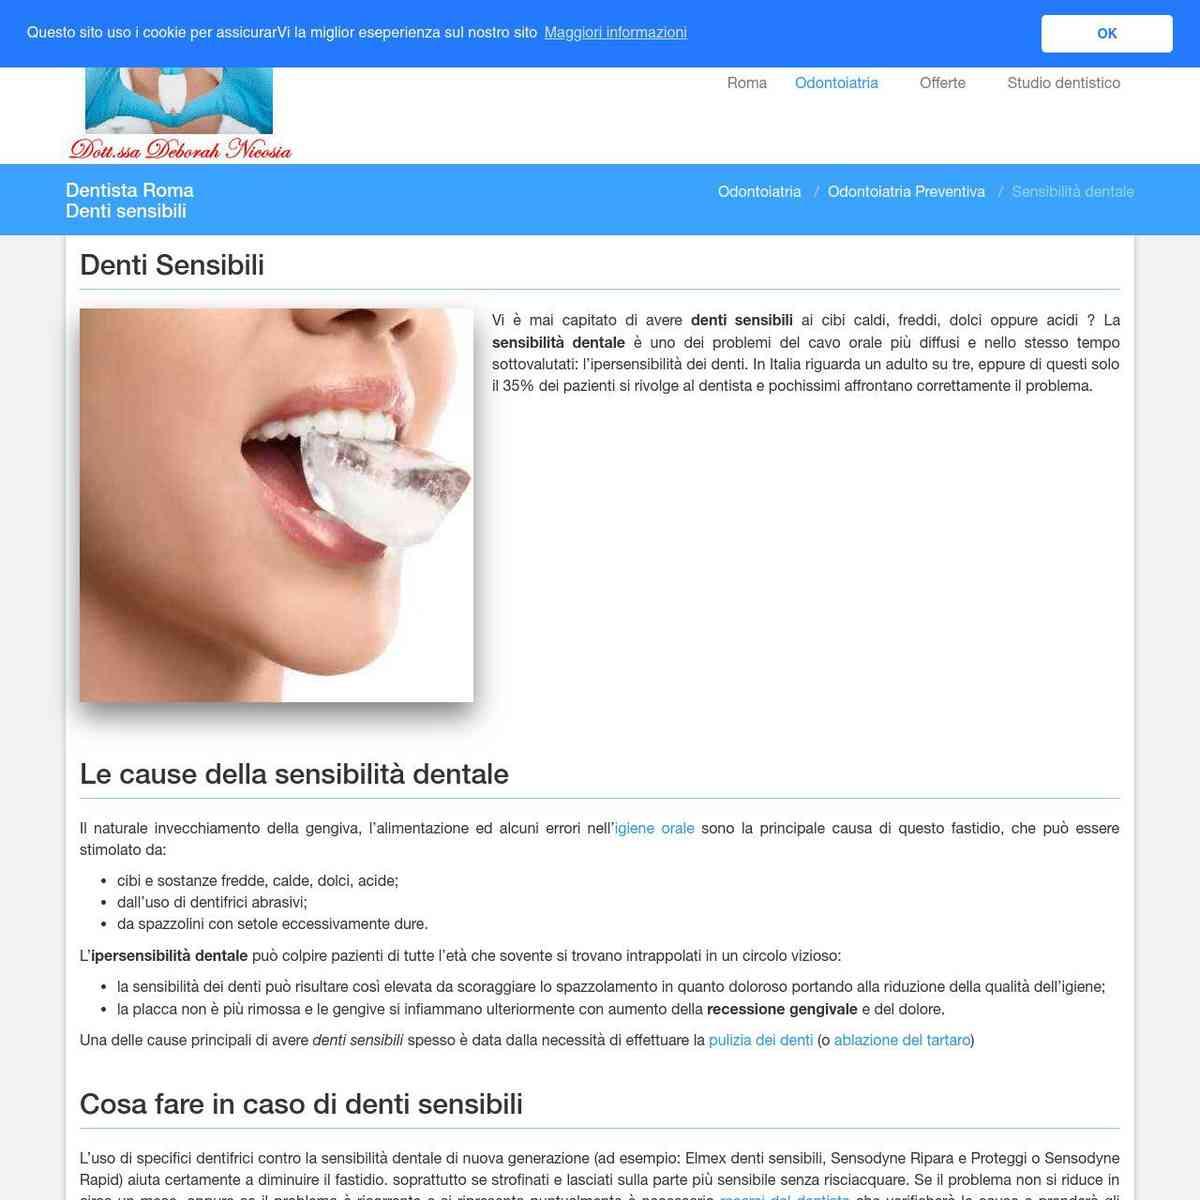 Denti sensibili - Dentista Roma